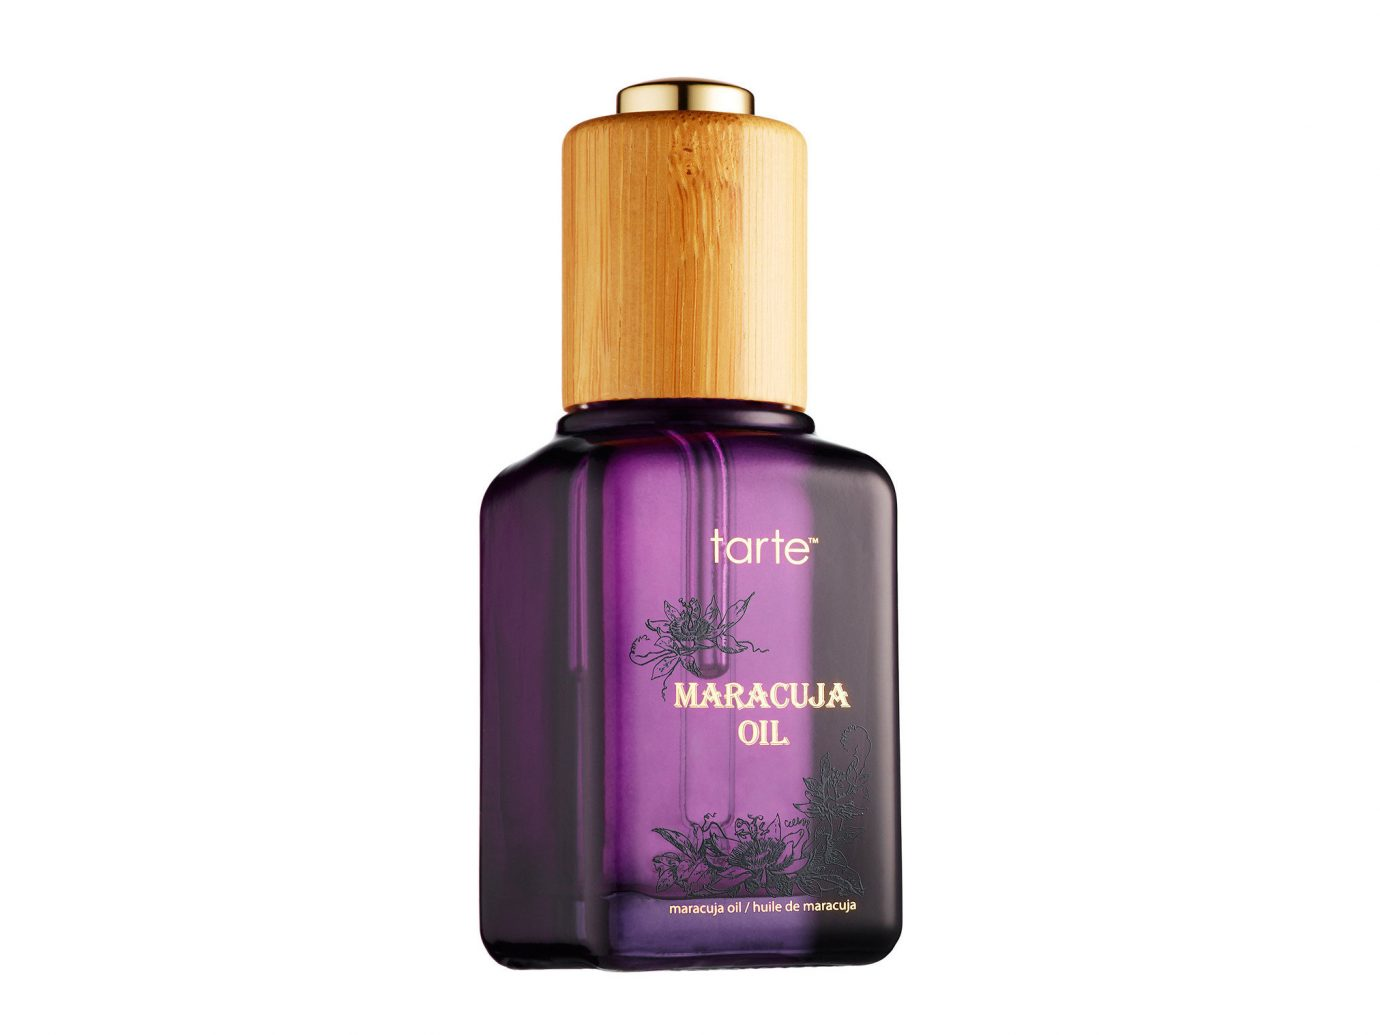 Travel Shop Travel Tips toiletry product perfume liquid cosmetics